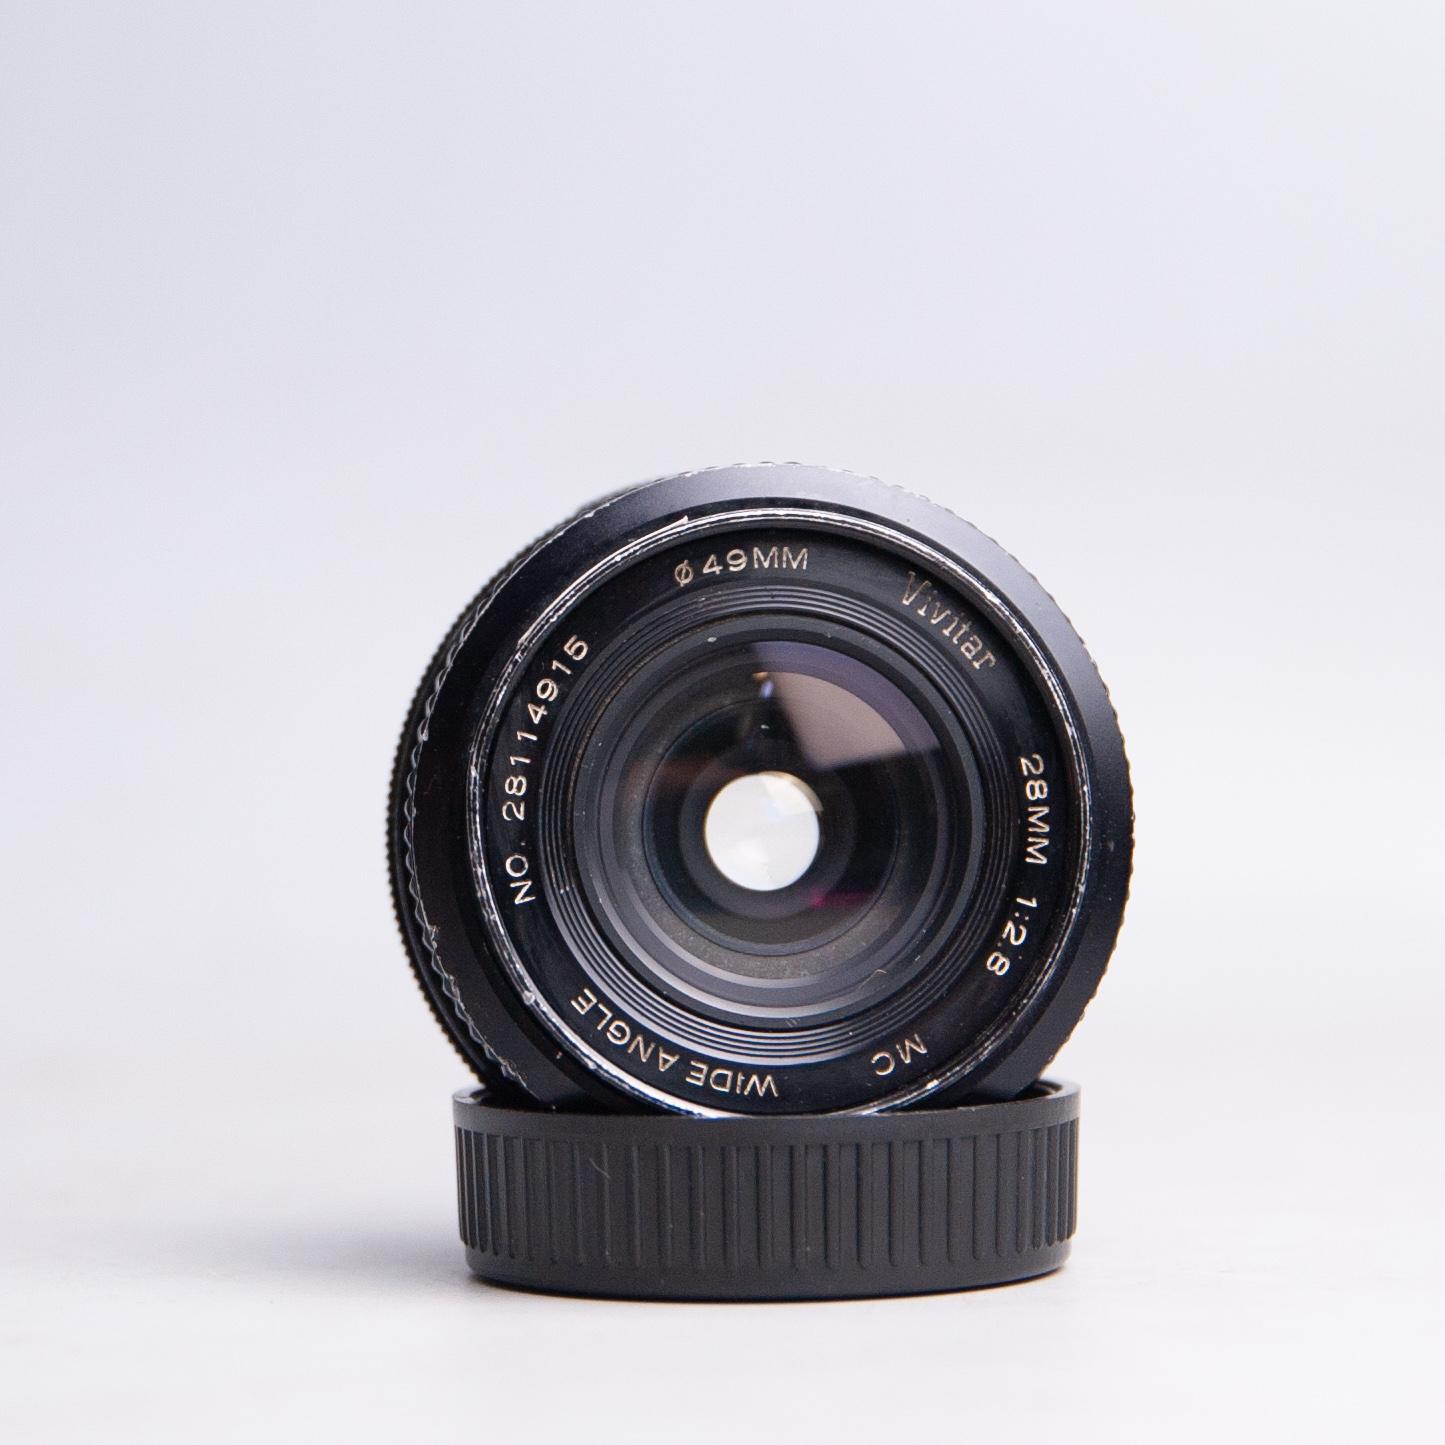 yashica-ml-50mm-f1-9c-ml-cy-50-1-9-18186